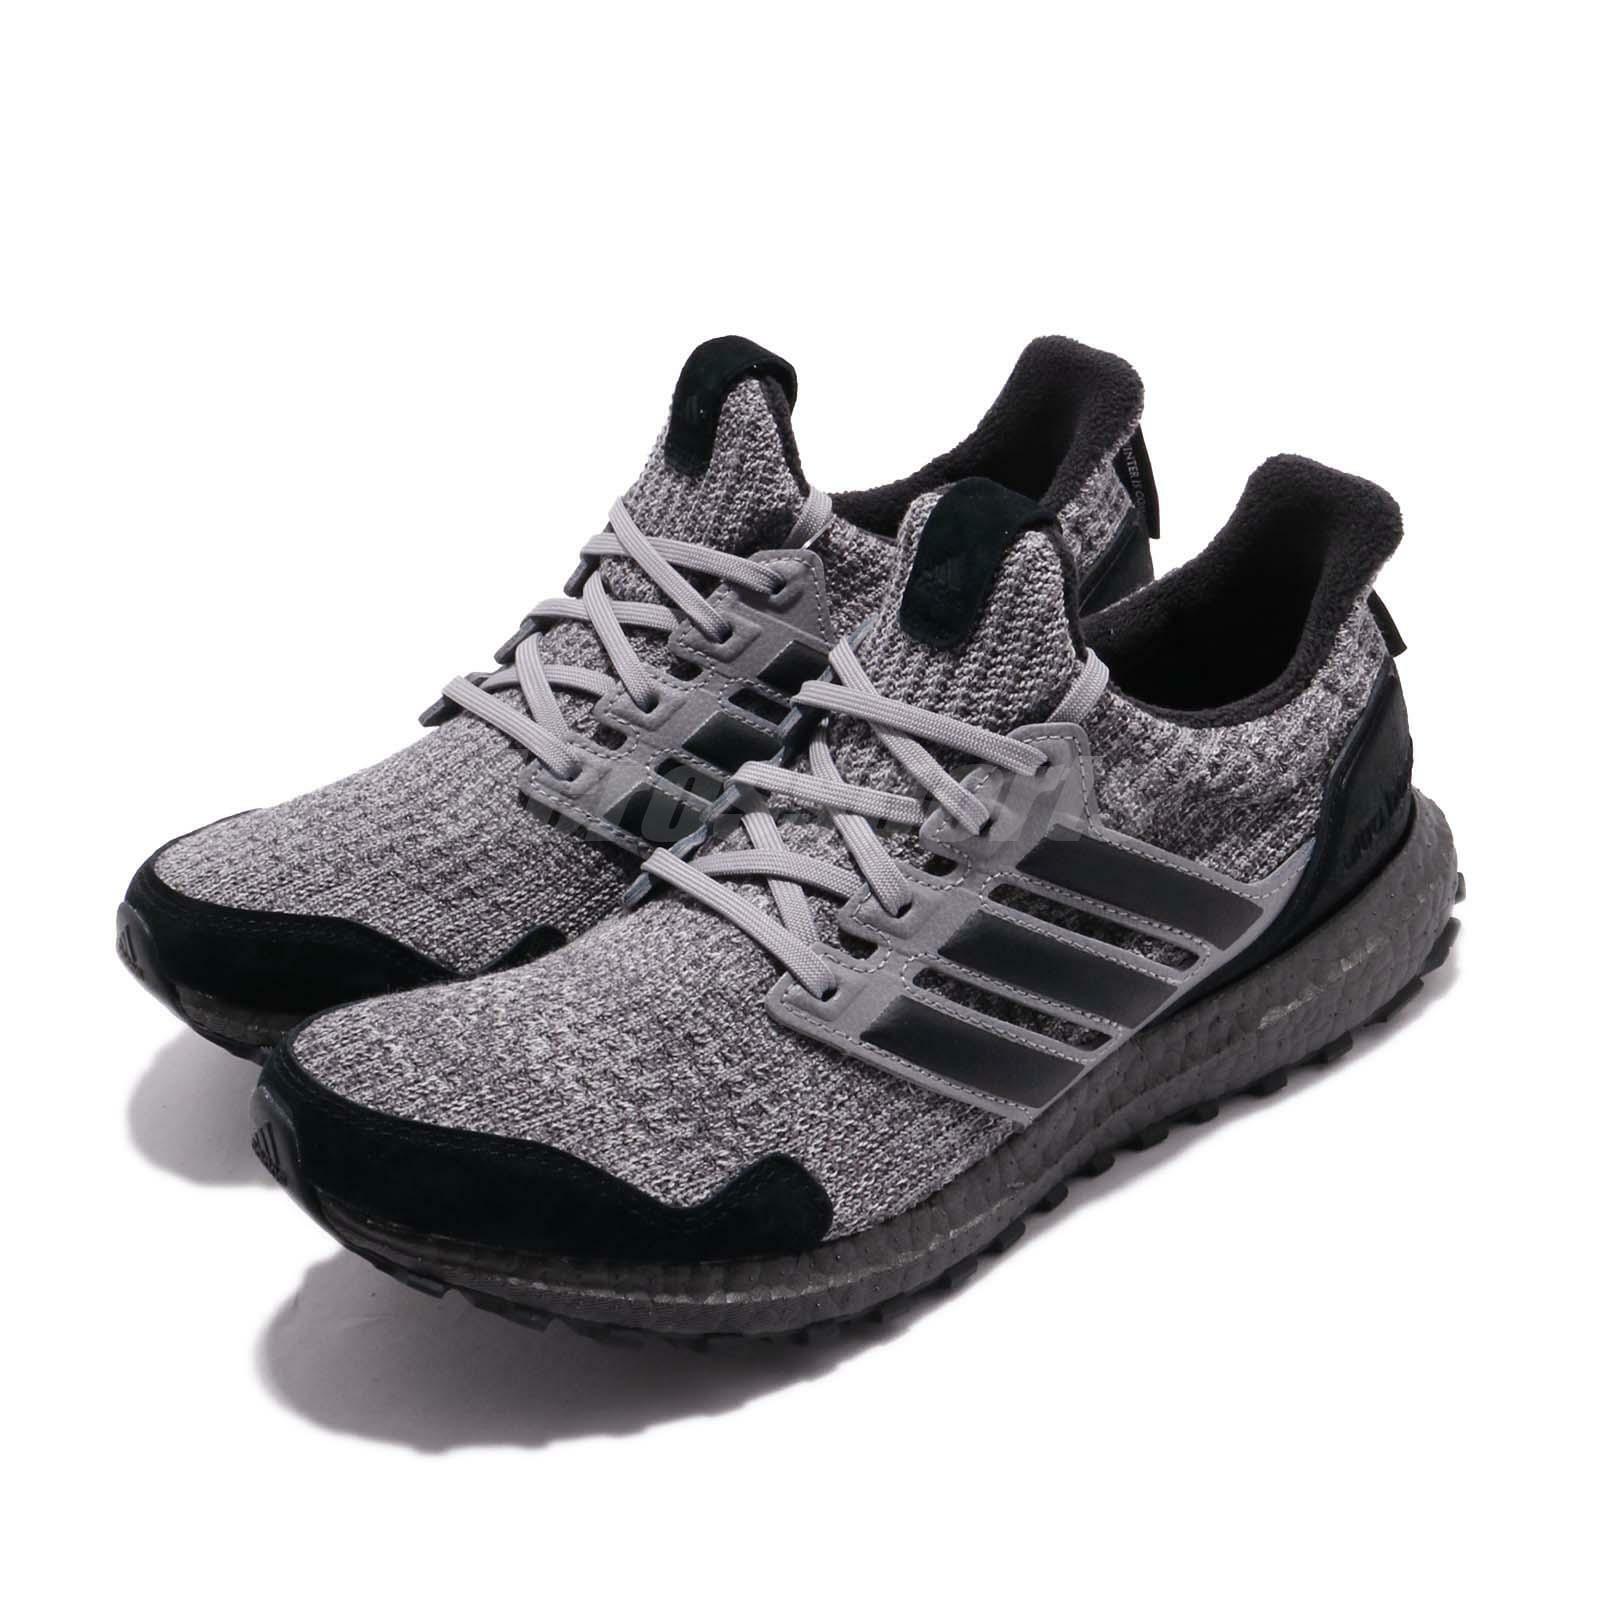 Adidas UltraBOOST Game Of Thrones House Stark negro gris Men Running zapatos EE3706